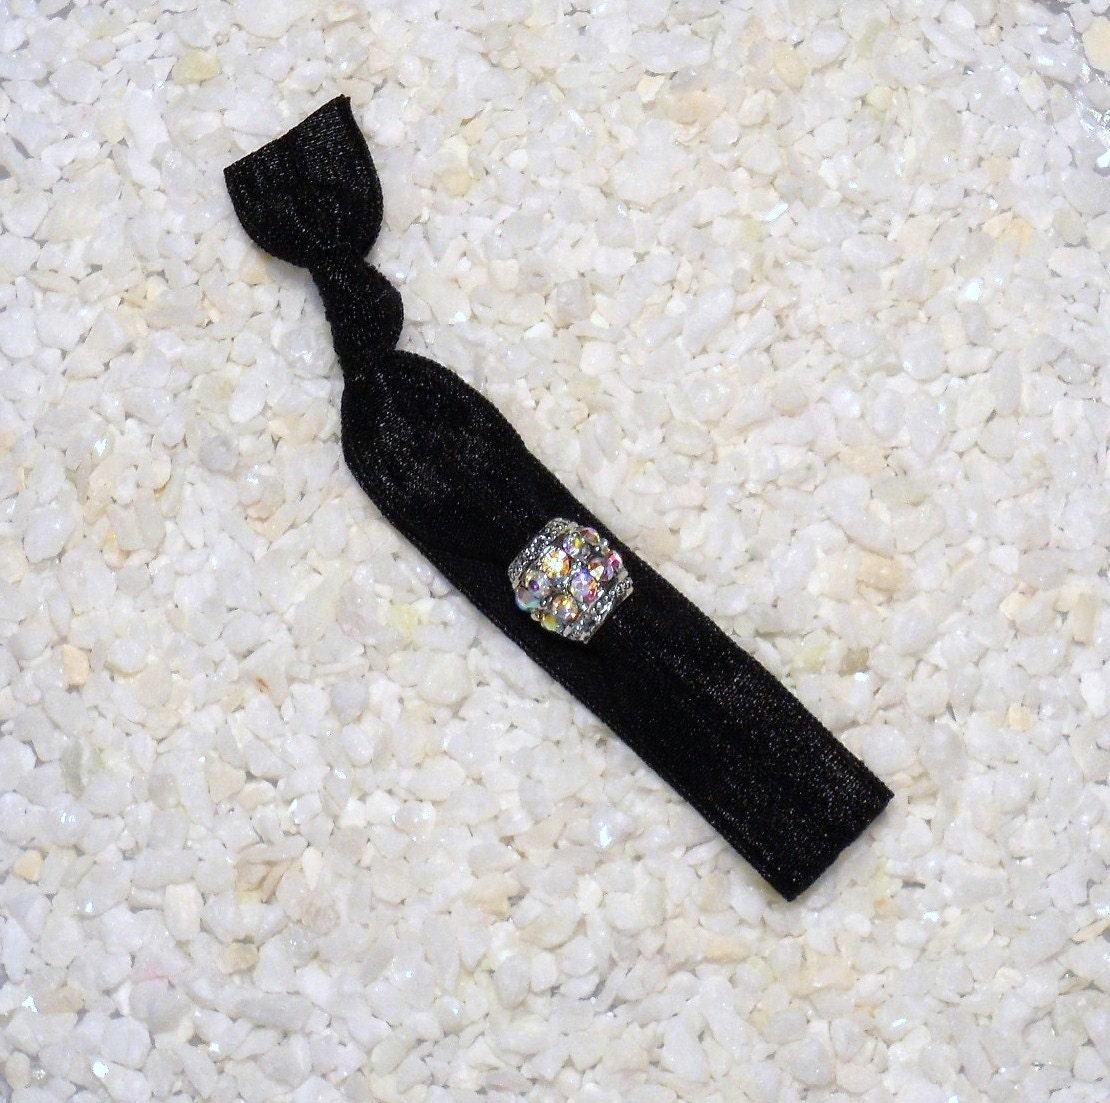 One Beaded Elastic Hair Tie - Black with Crystal Barrel Bead